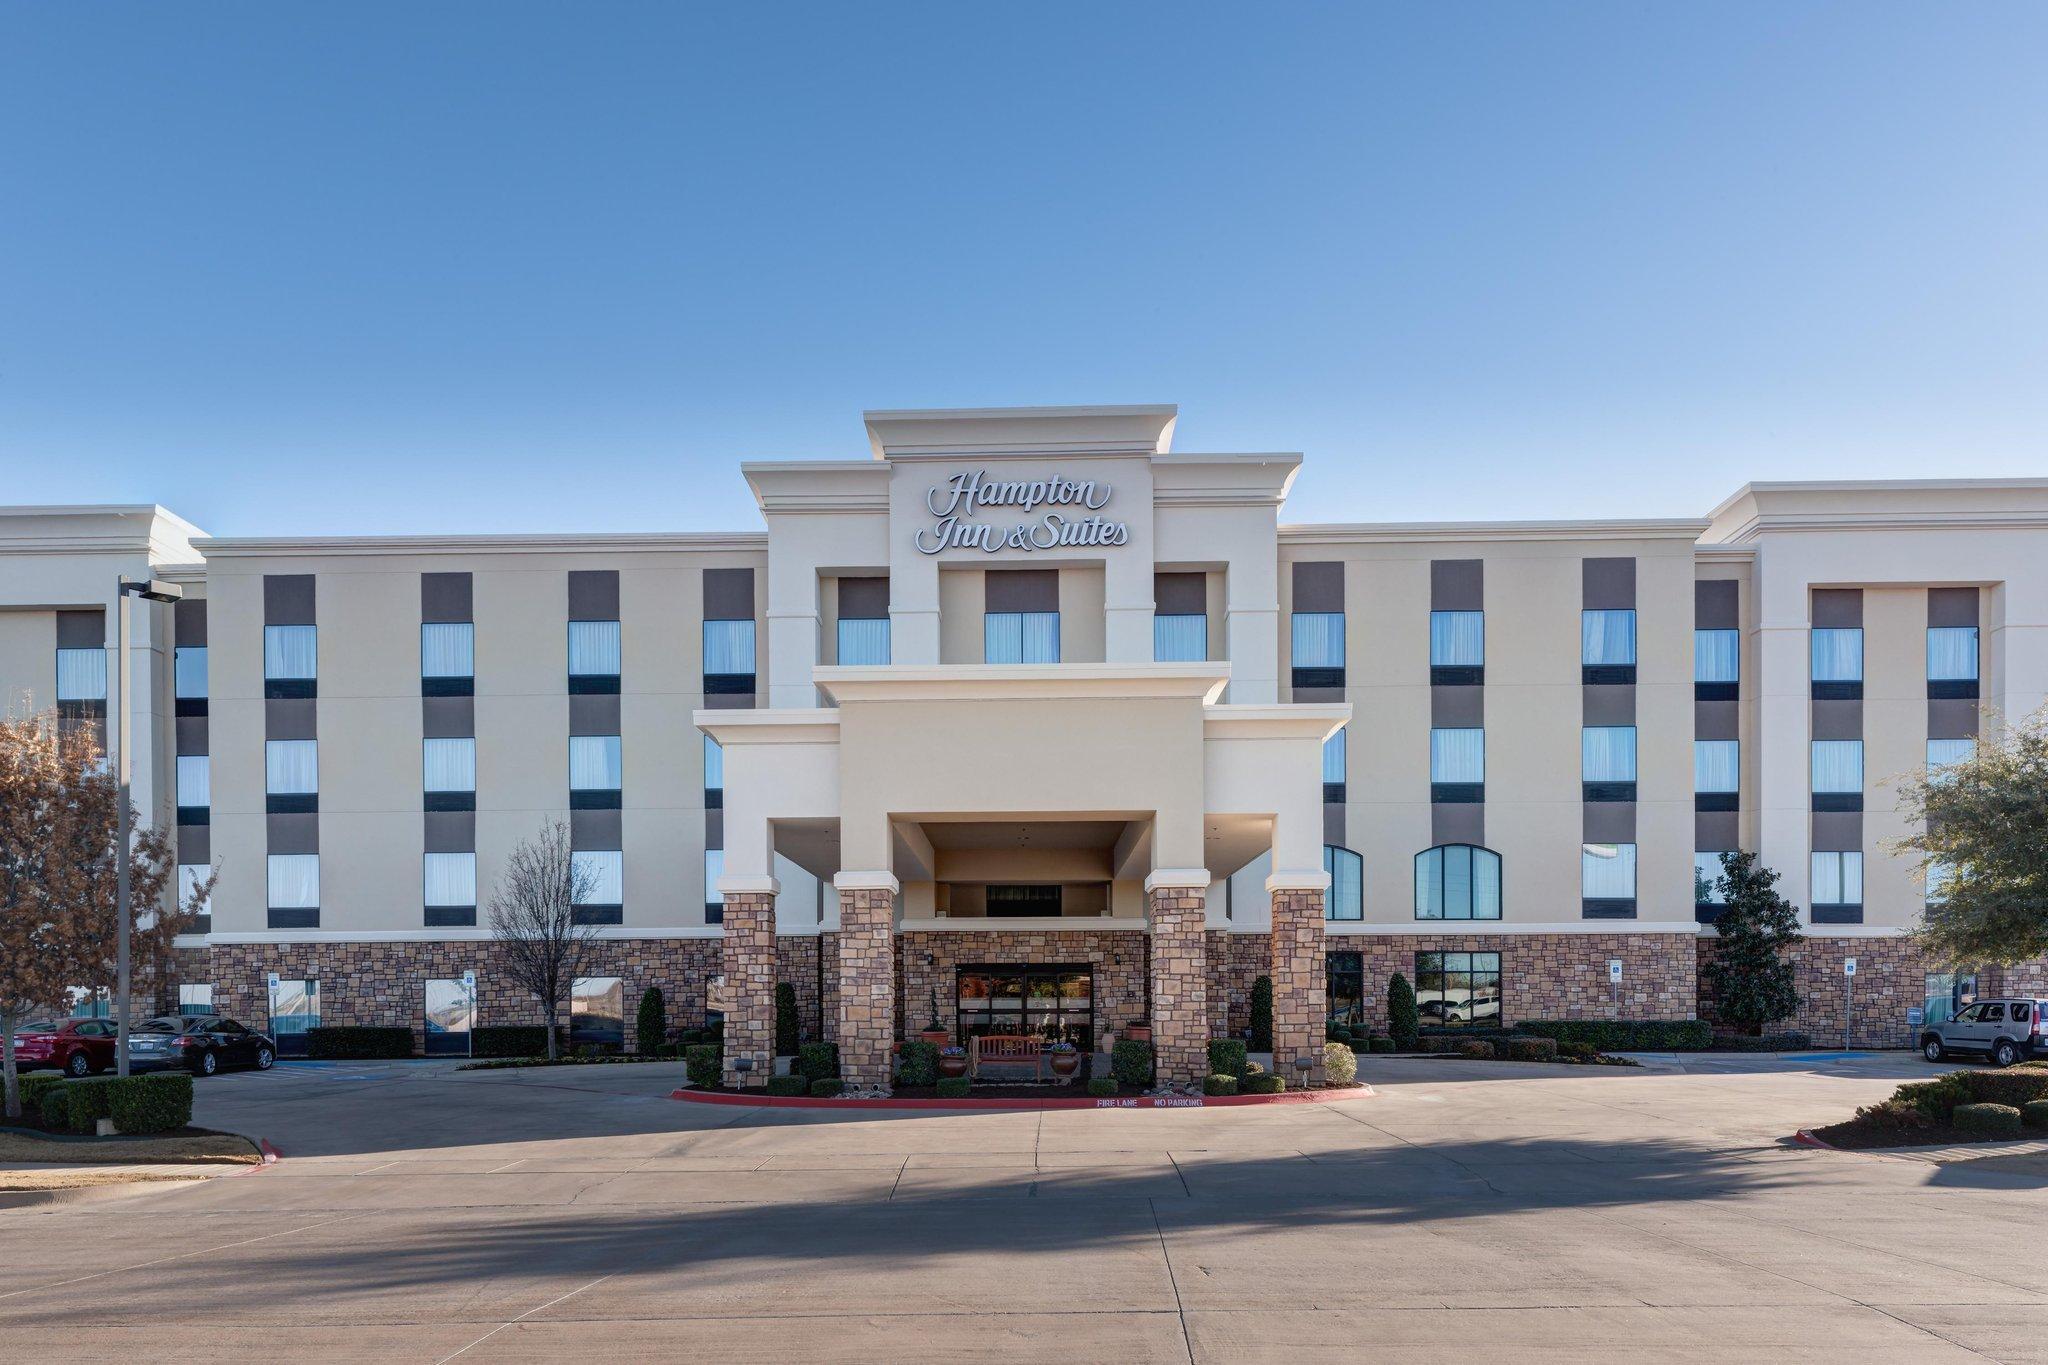 Hampton Inn And Suites Ft. Worth Burleson